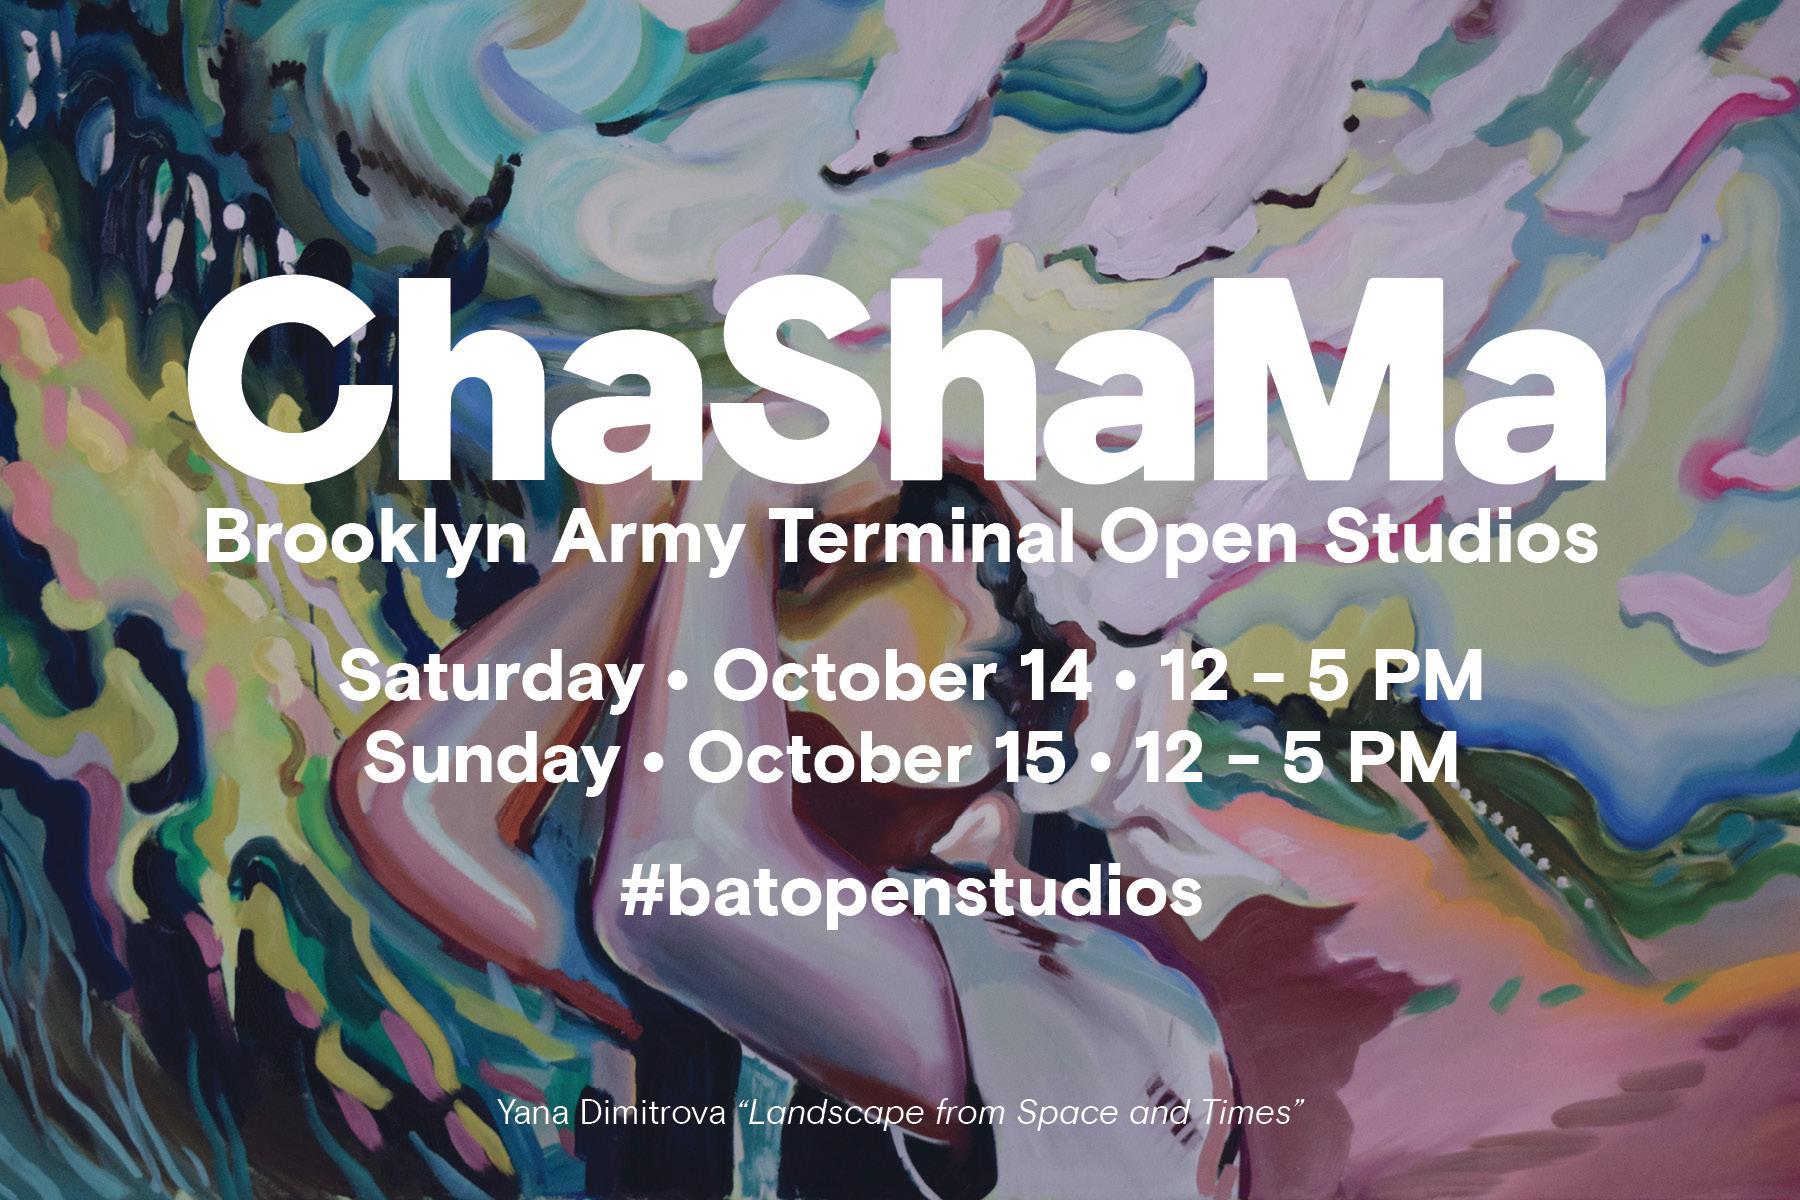 ChaShaMa 2017 Brooklyn Army Terminal Open Studios | Events Calendar